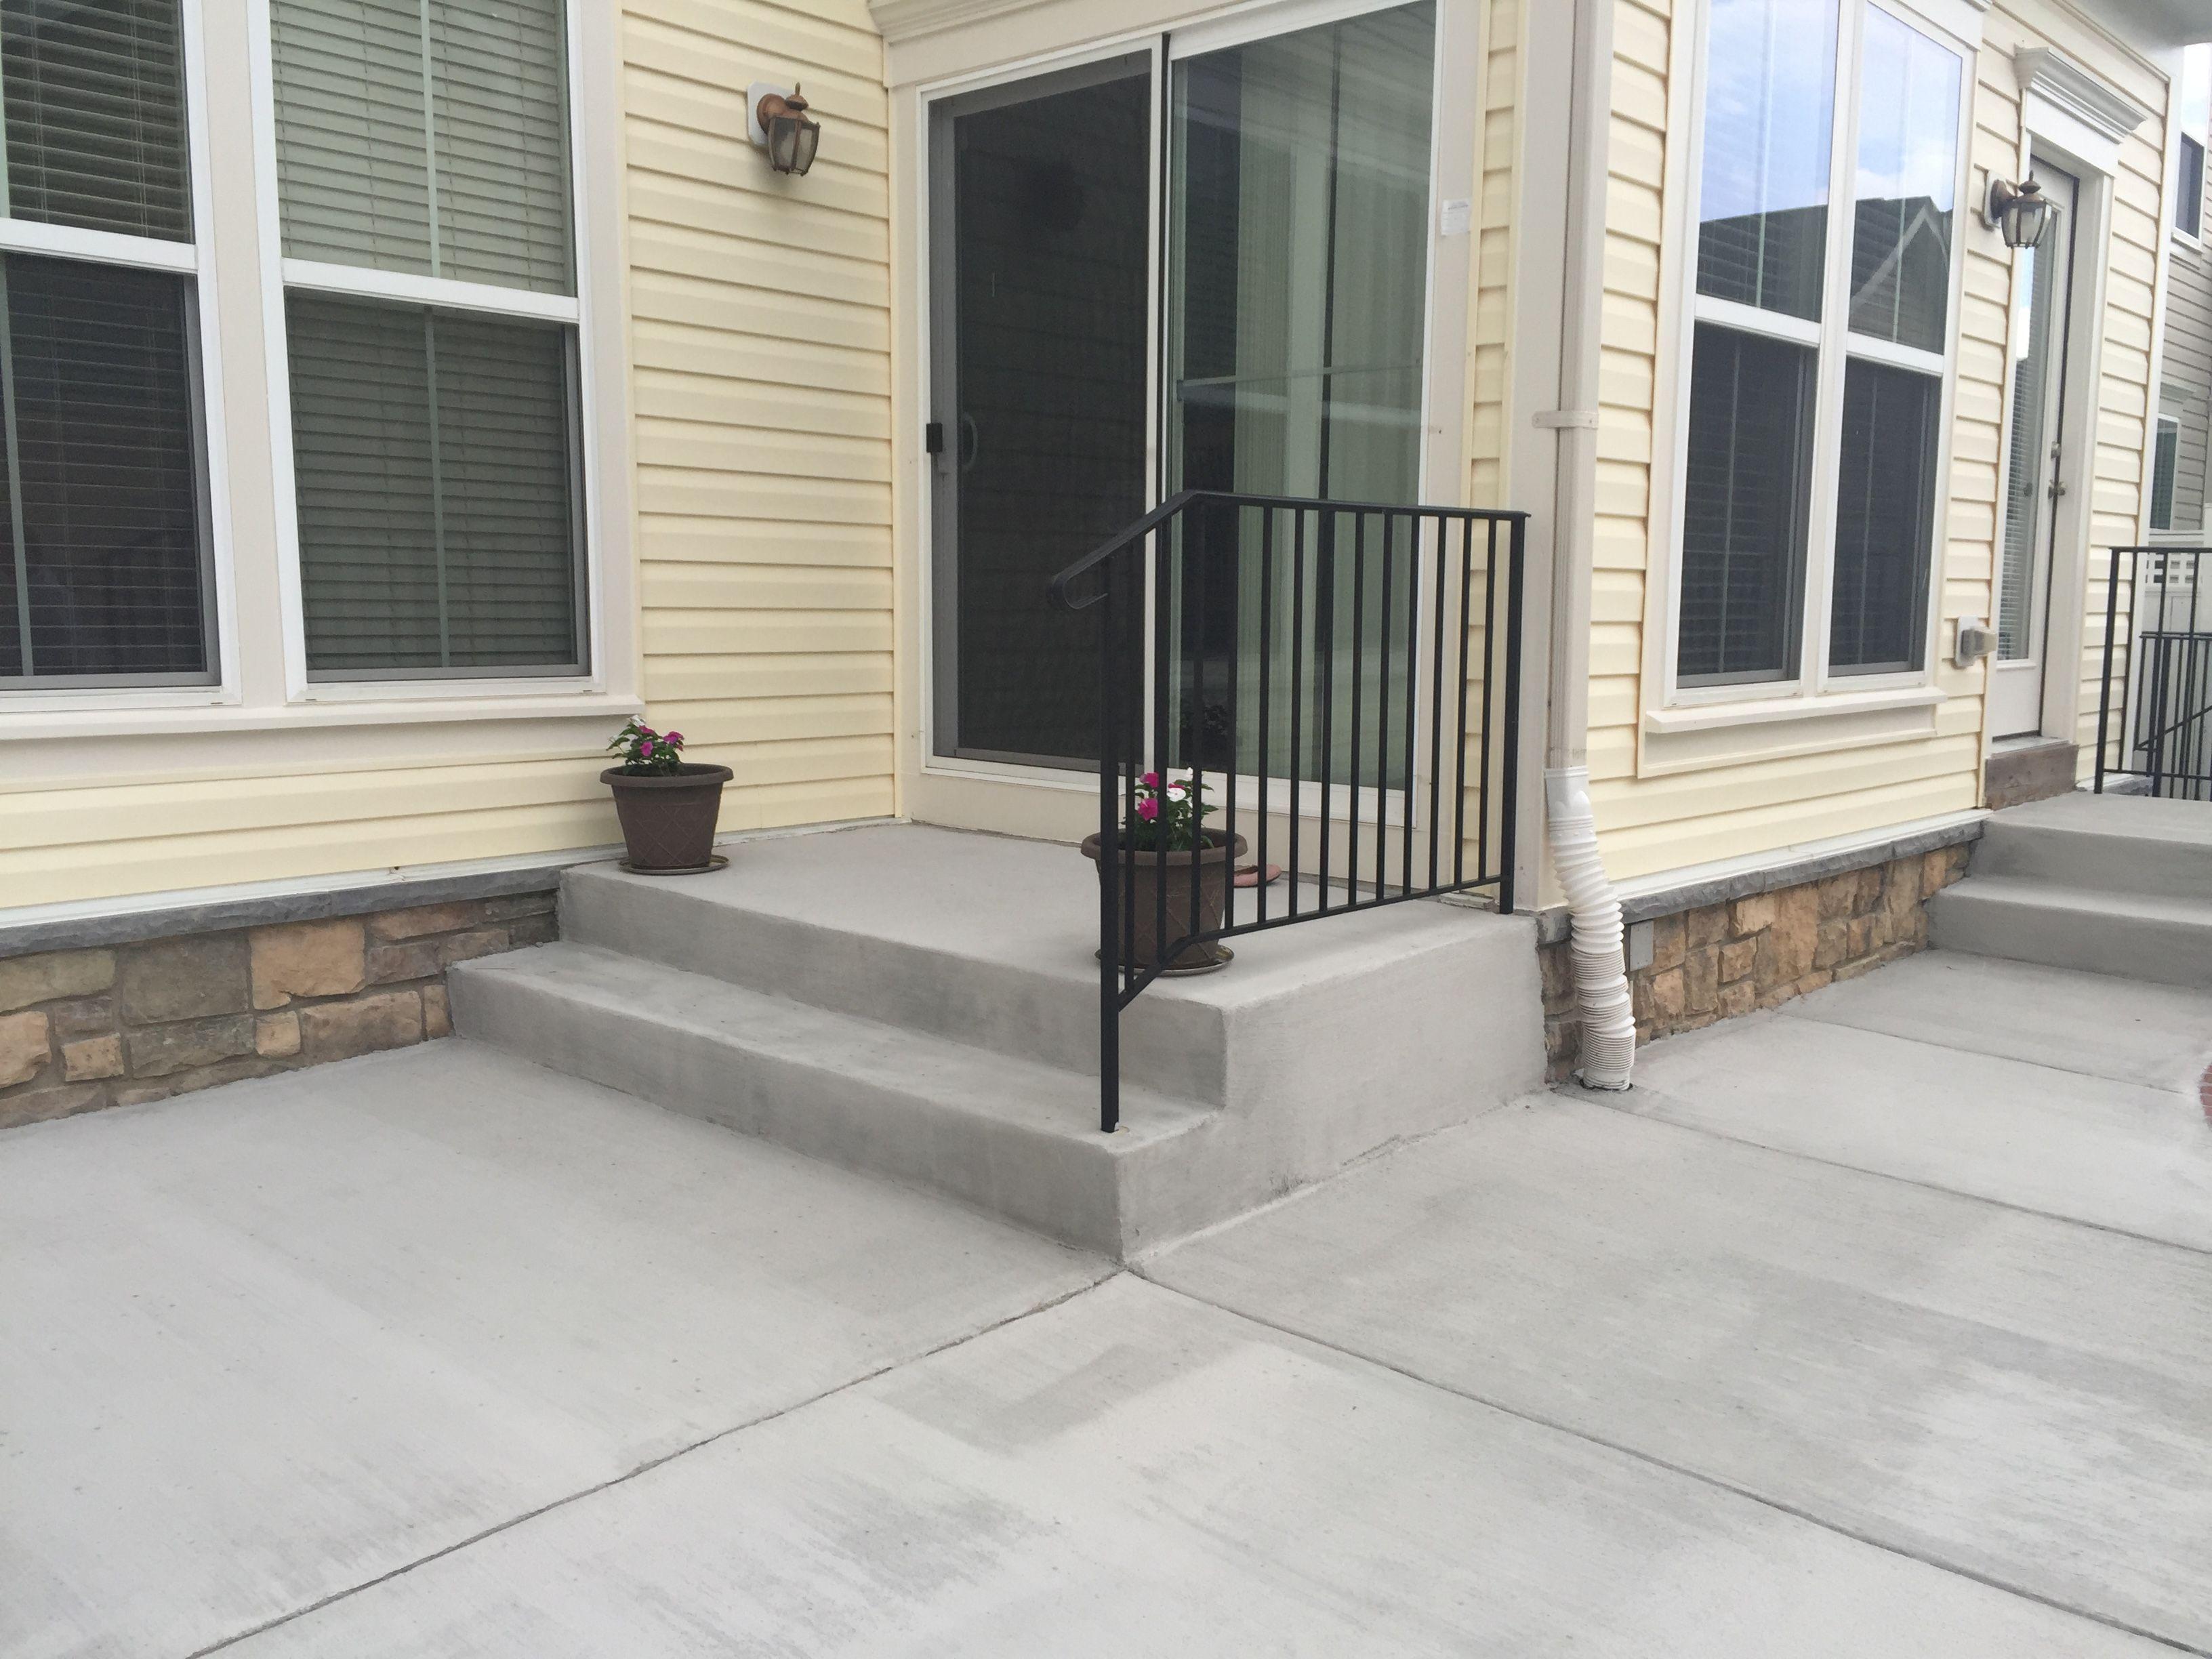 Best Concrete Patio In Ashburn Virginia Concrete Patio 400 x 300